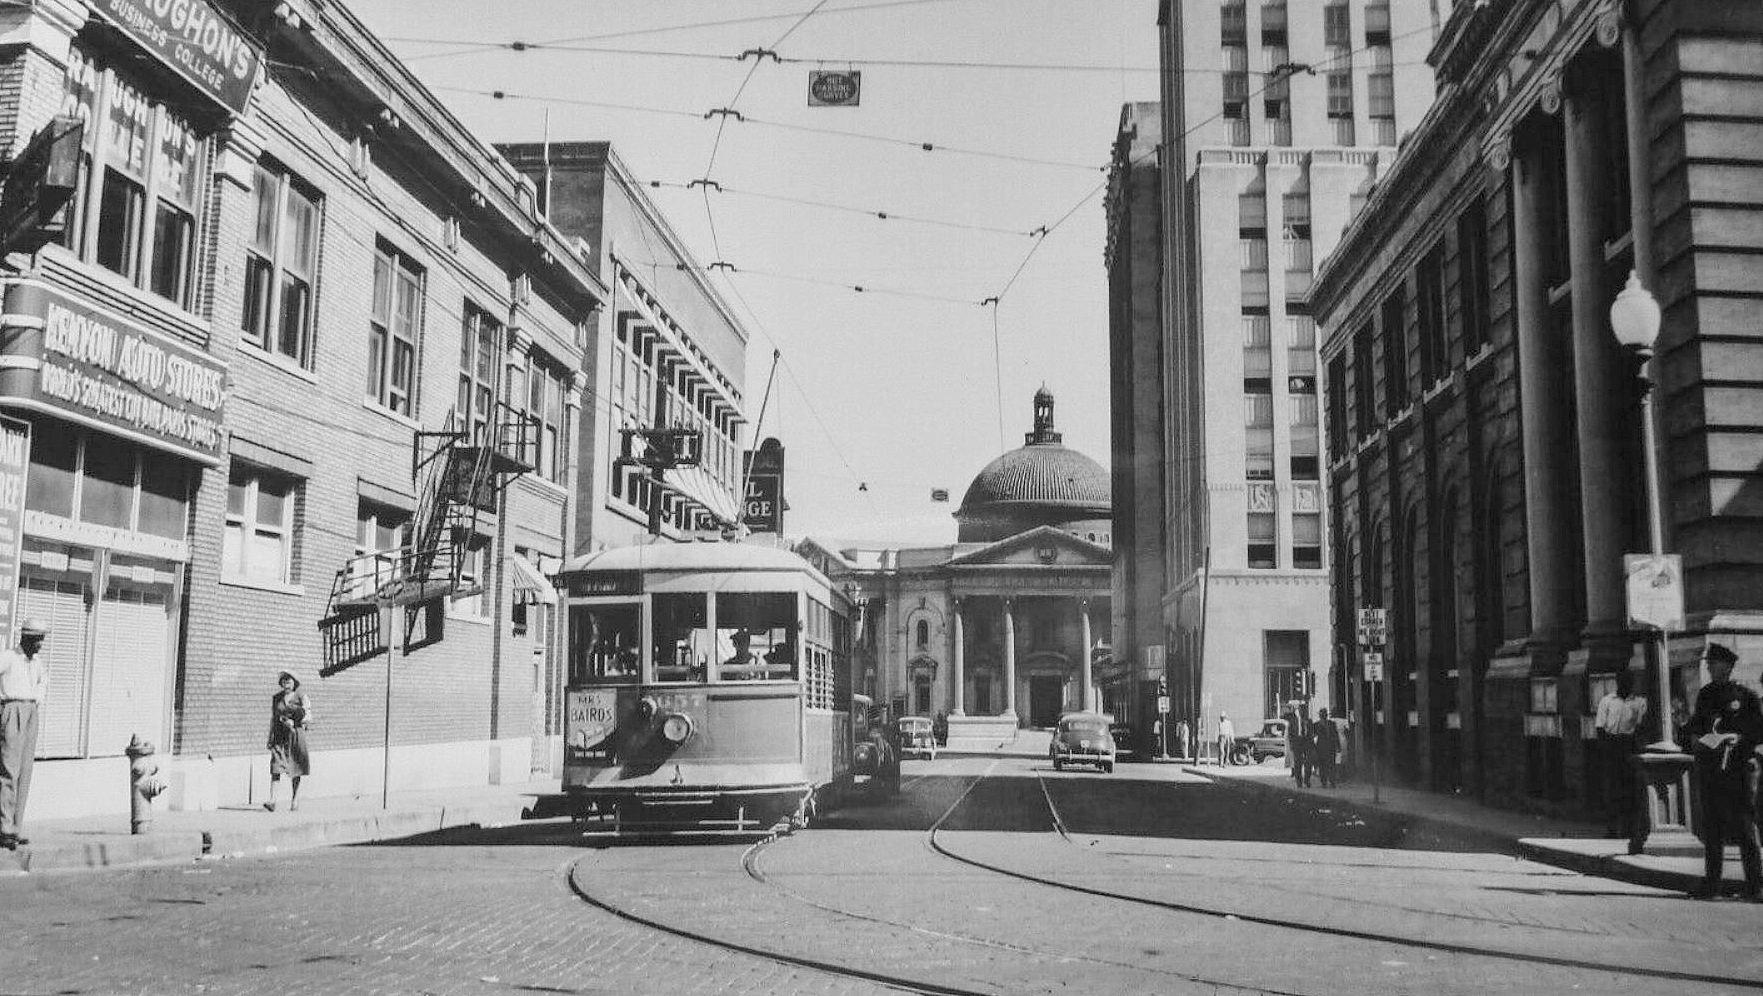 streetcar-harwood_draughon_ebay